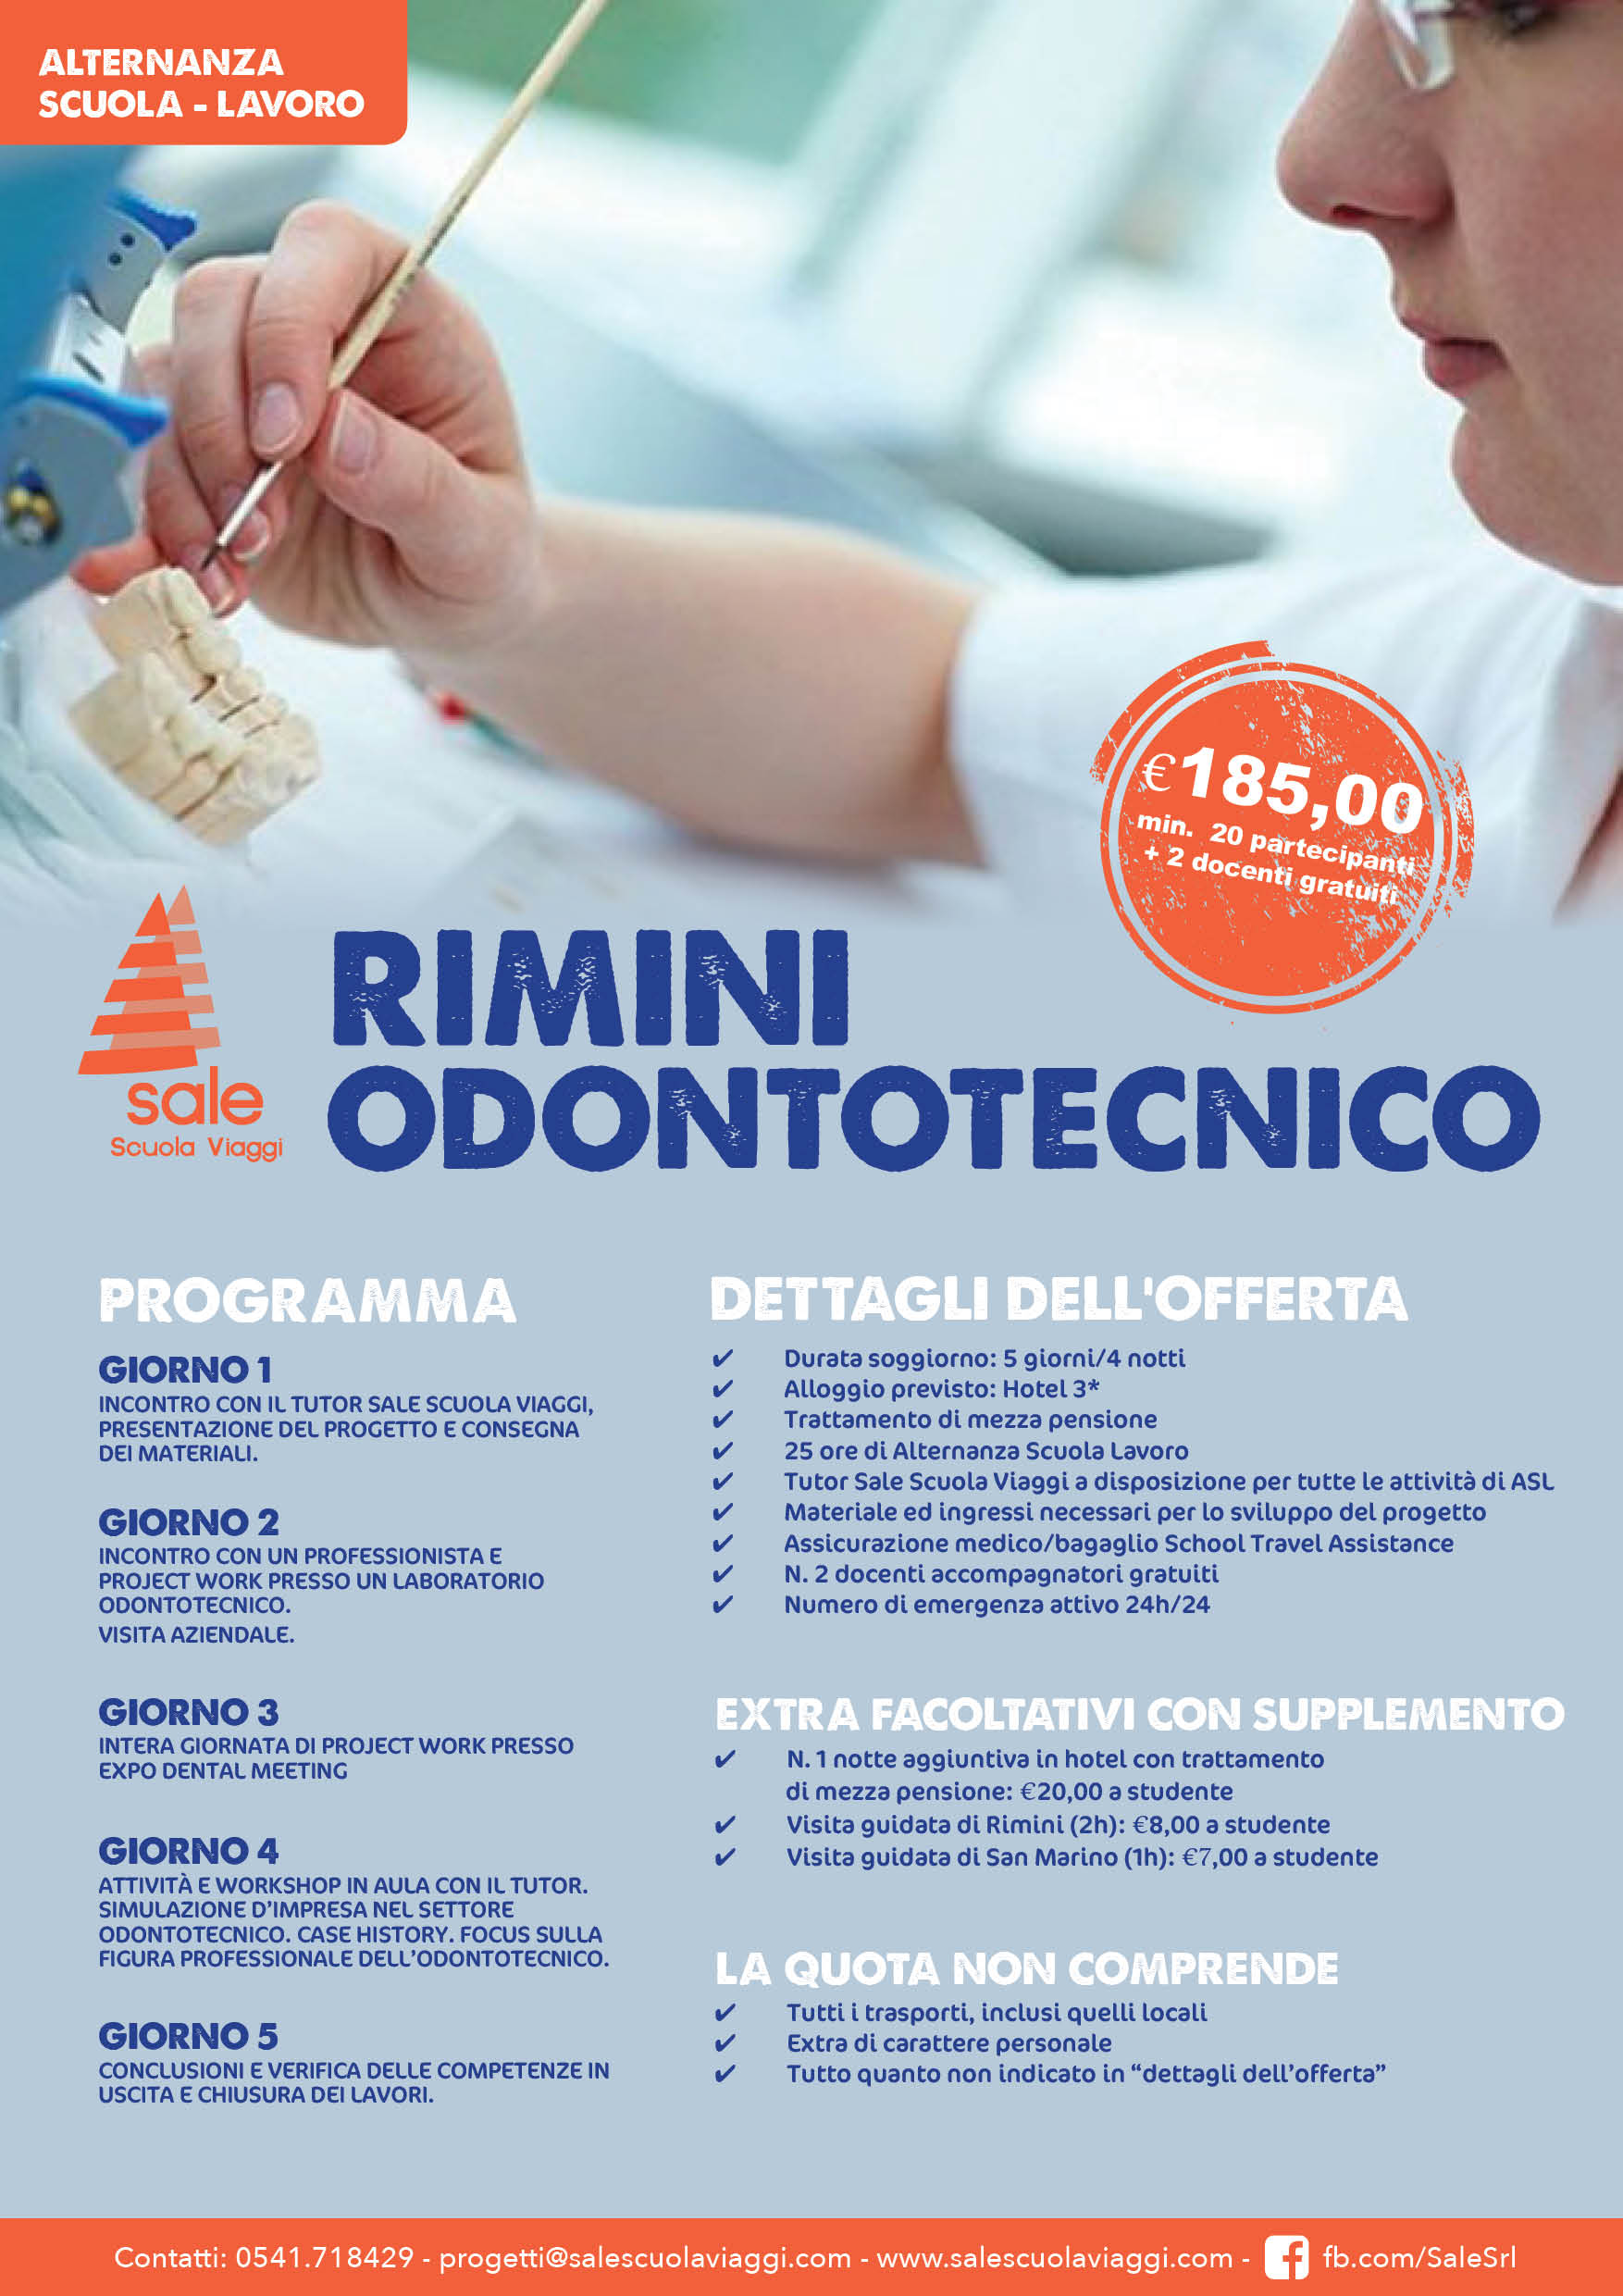 Offerta Odontotecnico Rimini - Sale Scuola Viaggi